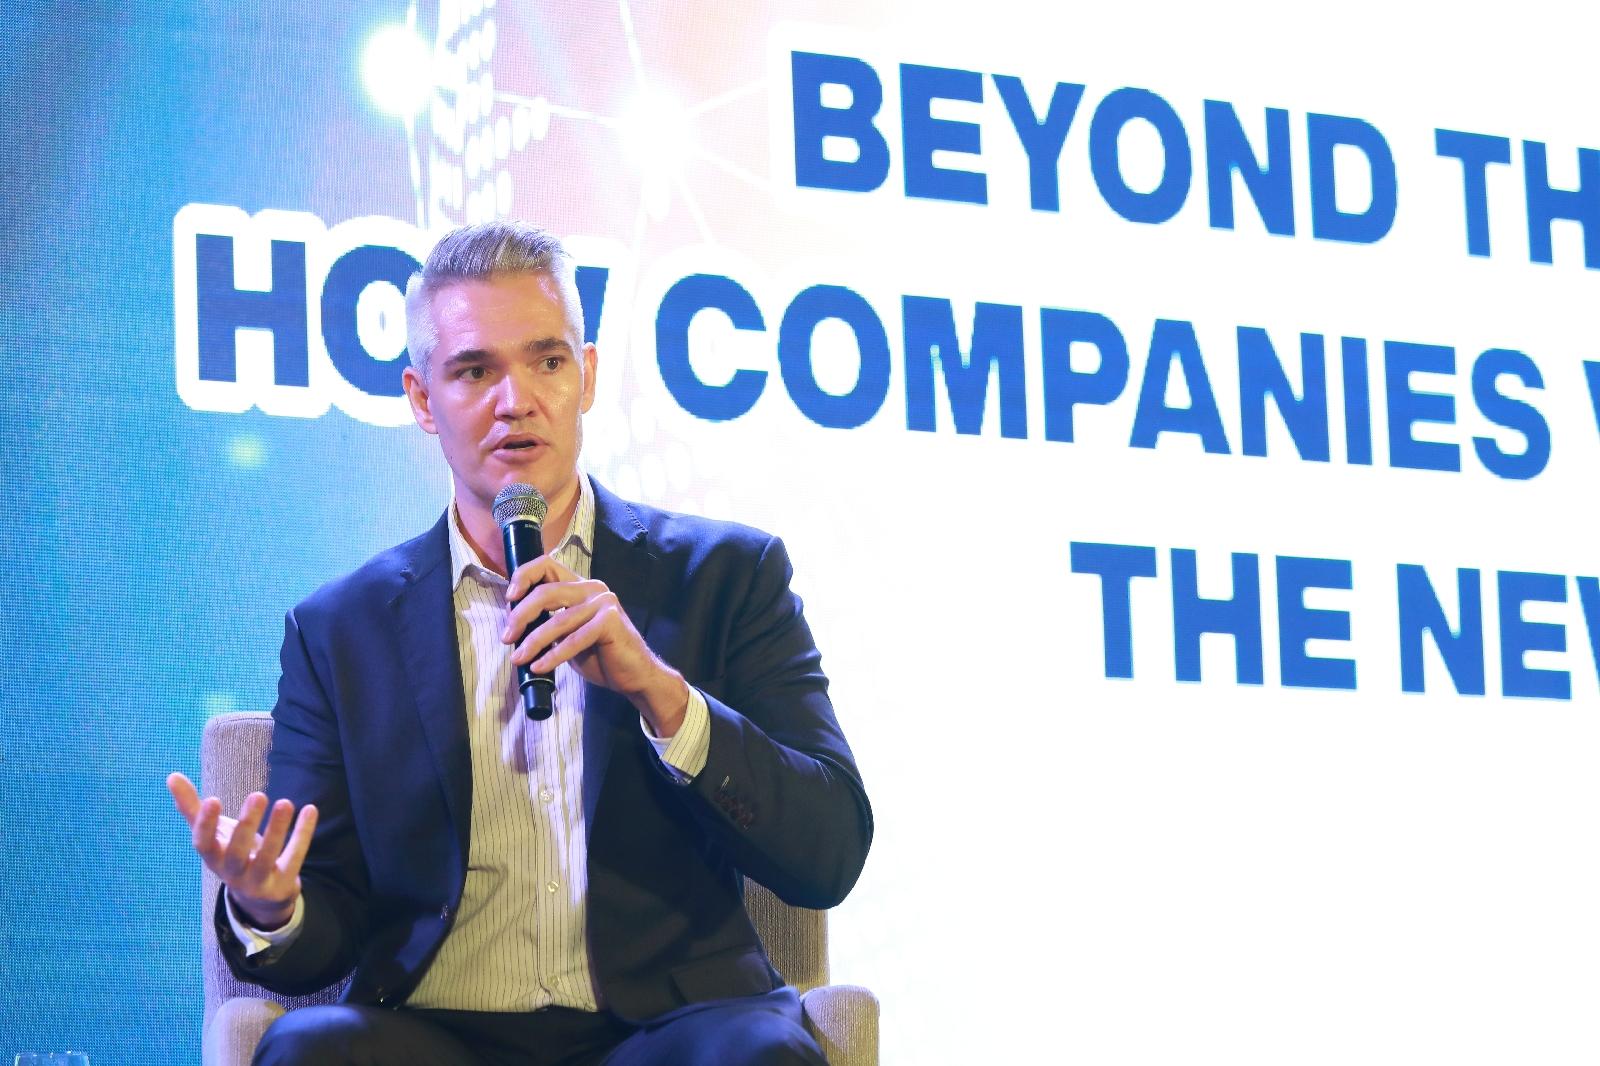 """Beyond the Pandemic: A Decade of Challenges from 2021 "" เตรียมพร้อมรับมือโลกหลังวิกฤติโรคระบาดด้วยเทคโนโลยี"